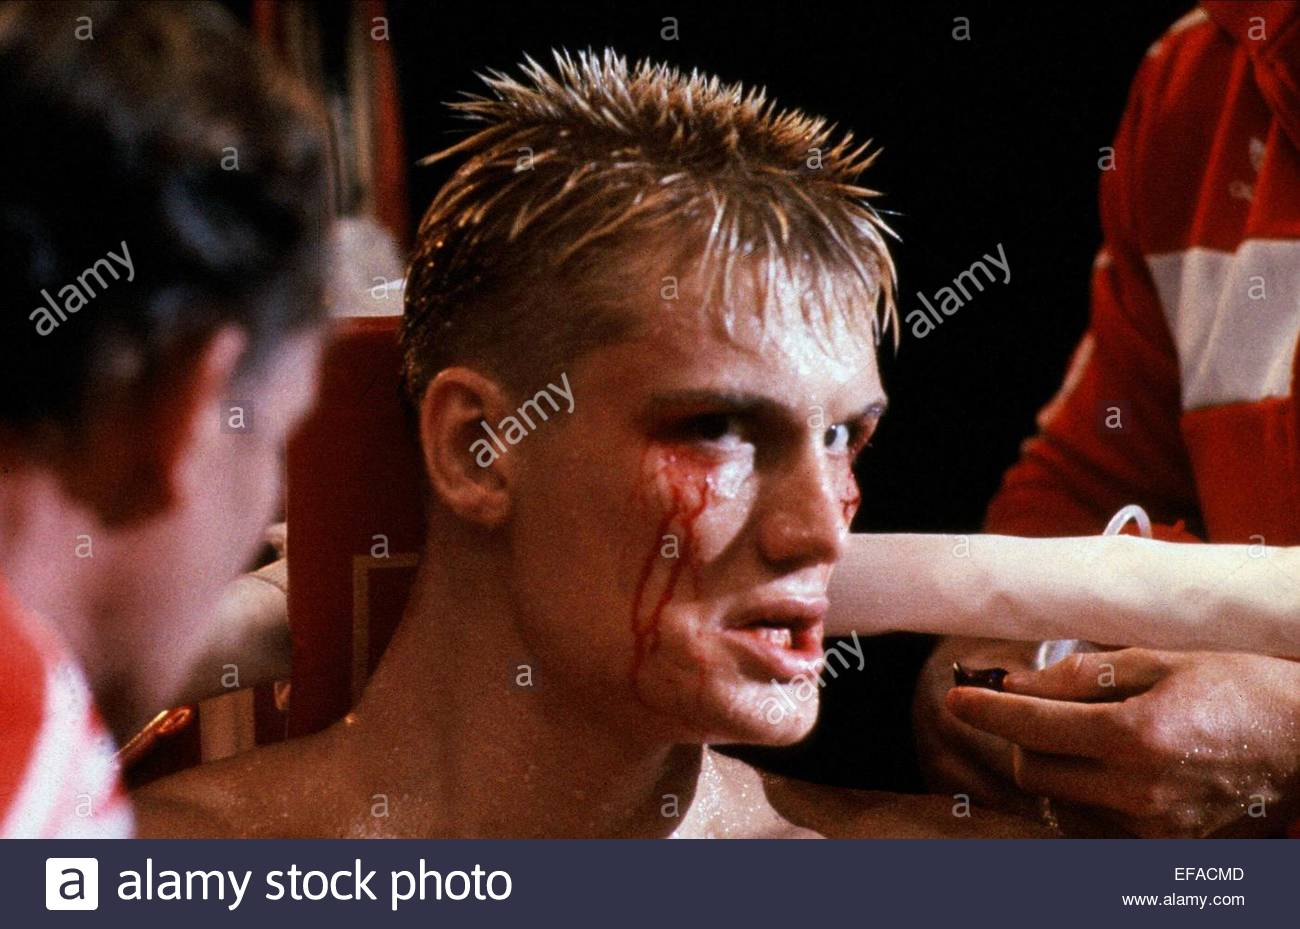 DOLPH LUNDGREN ROCKY IV (1985) - Stock Image